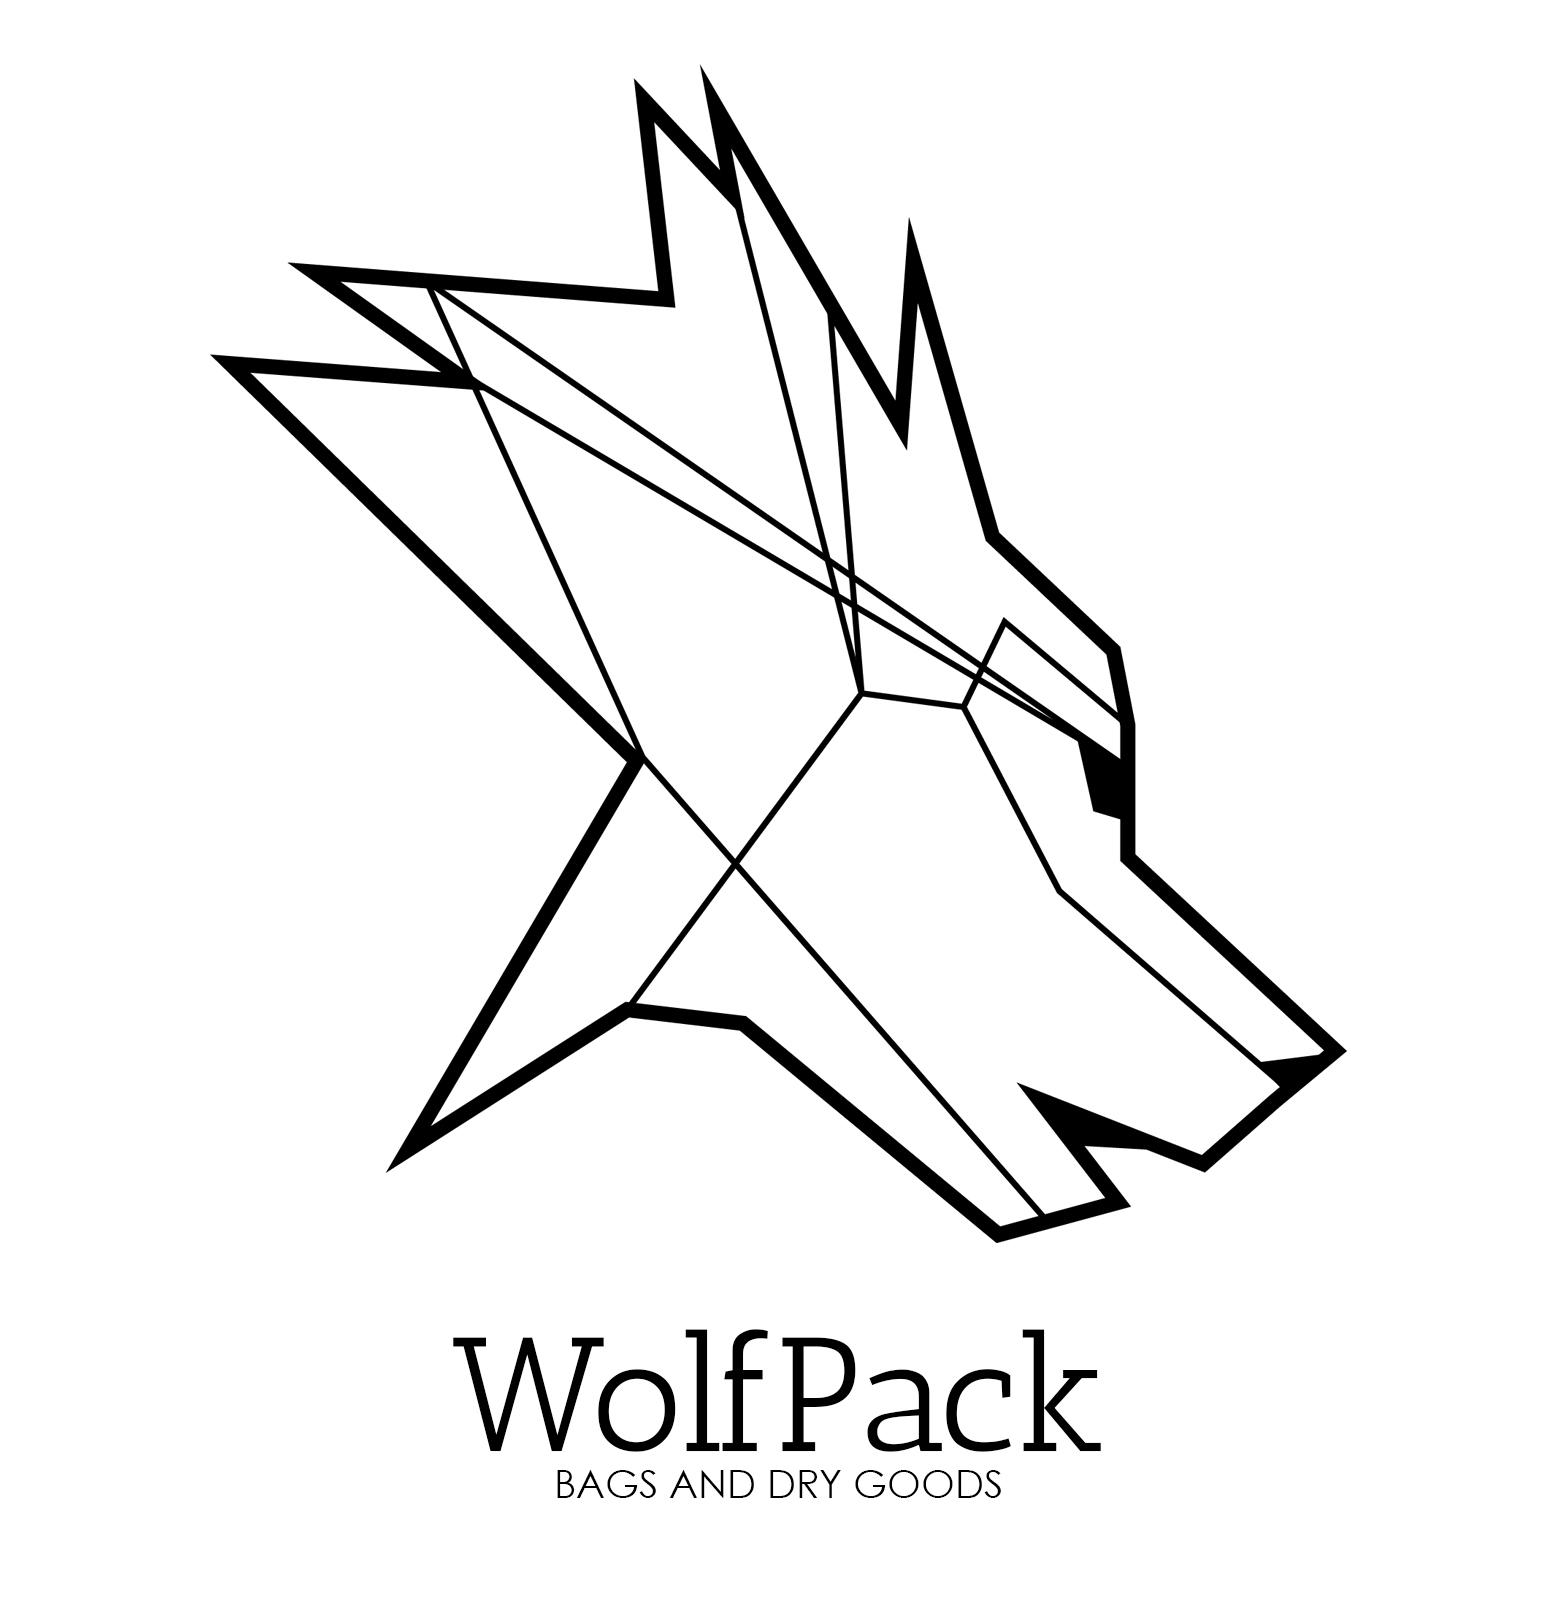 WOLFPACK BAGS AND OGODS.jpg